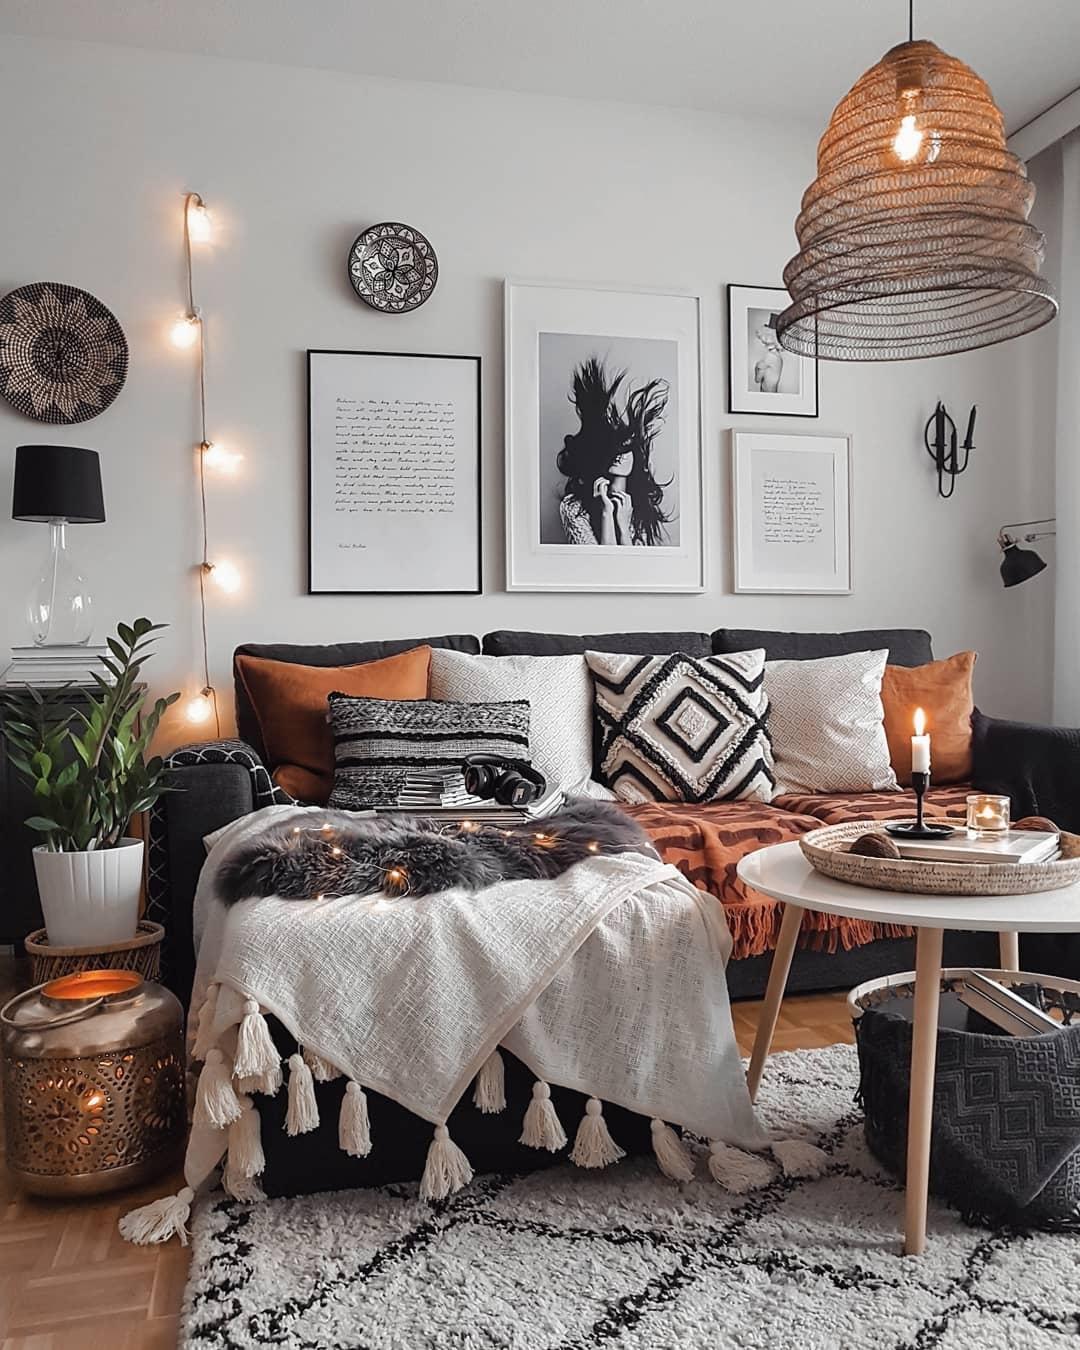 Stylish Home Decor Hacks For Renters